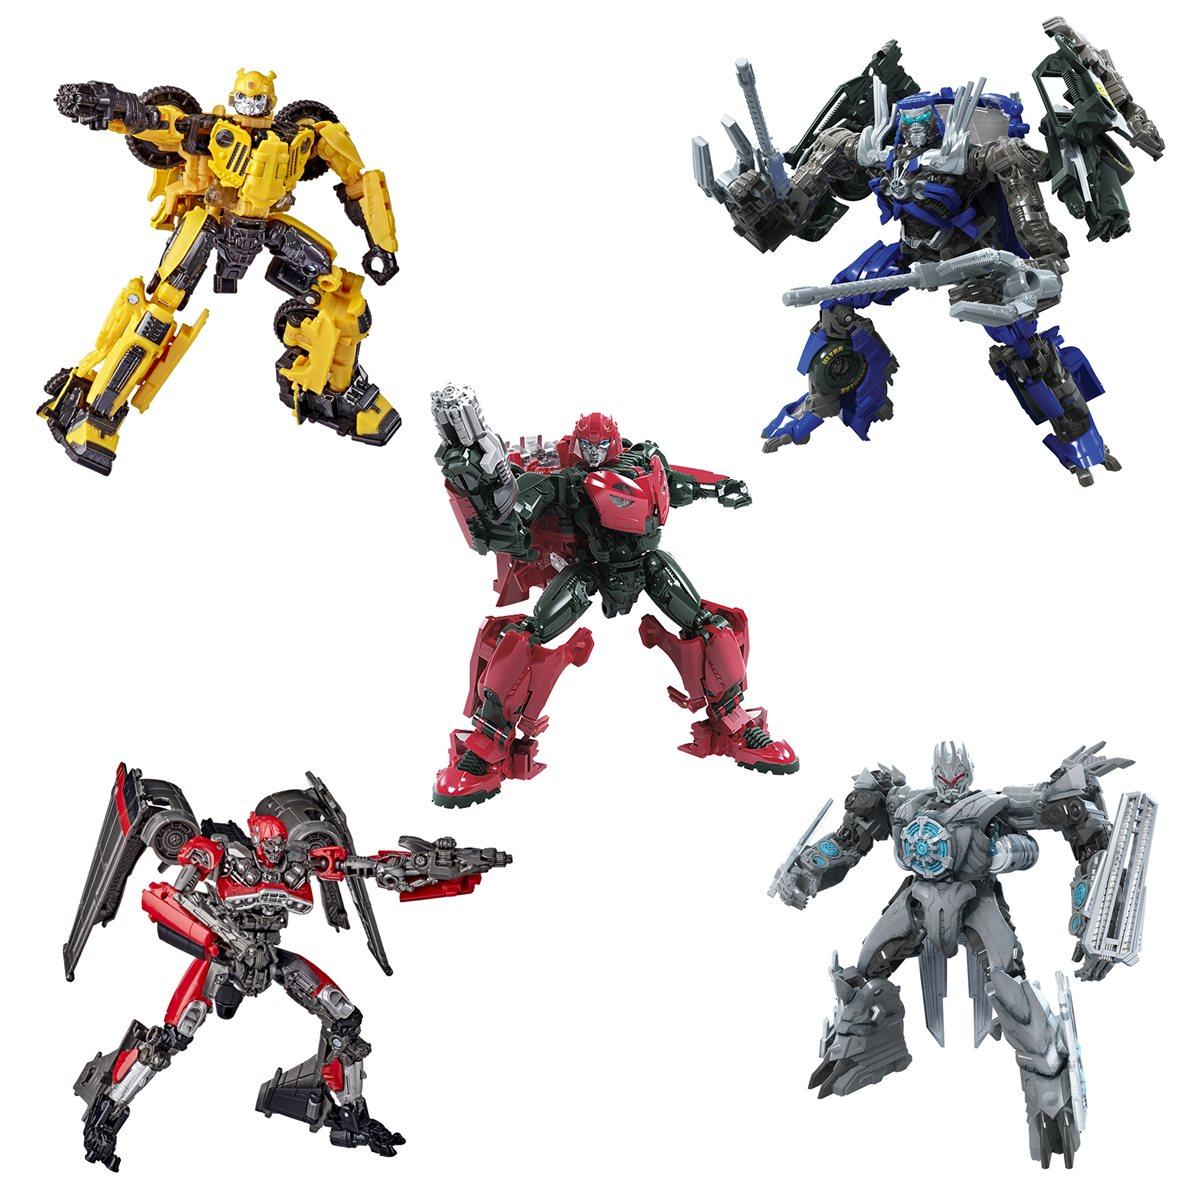 Hasbro Transformers Studio Series Premier Leader Wave 4 Scavenger IN STOCK